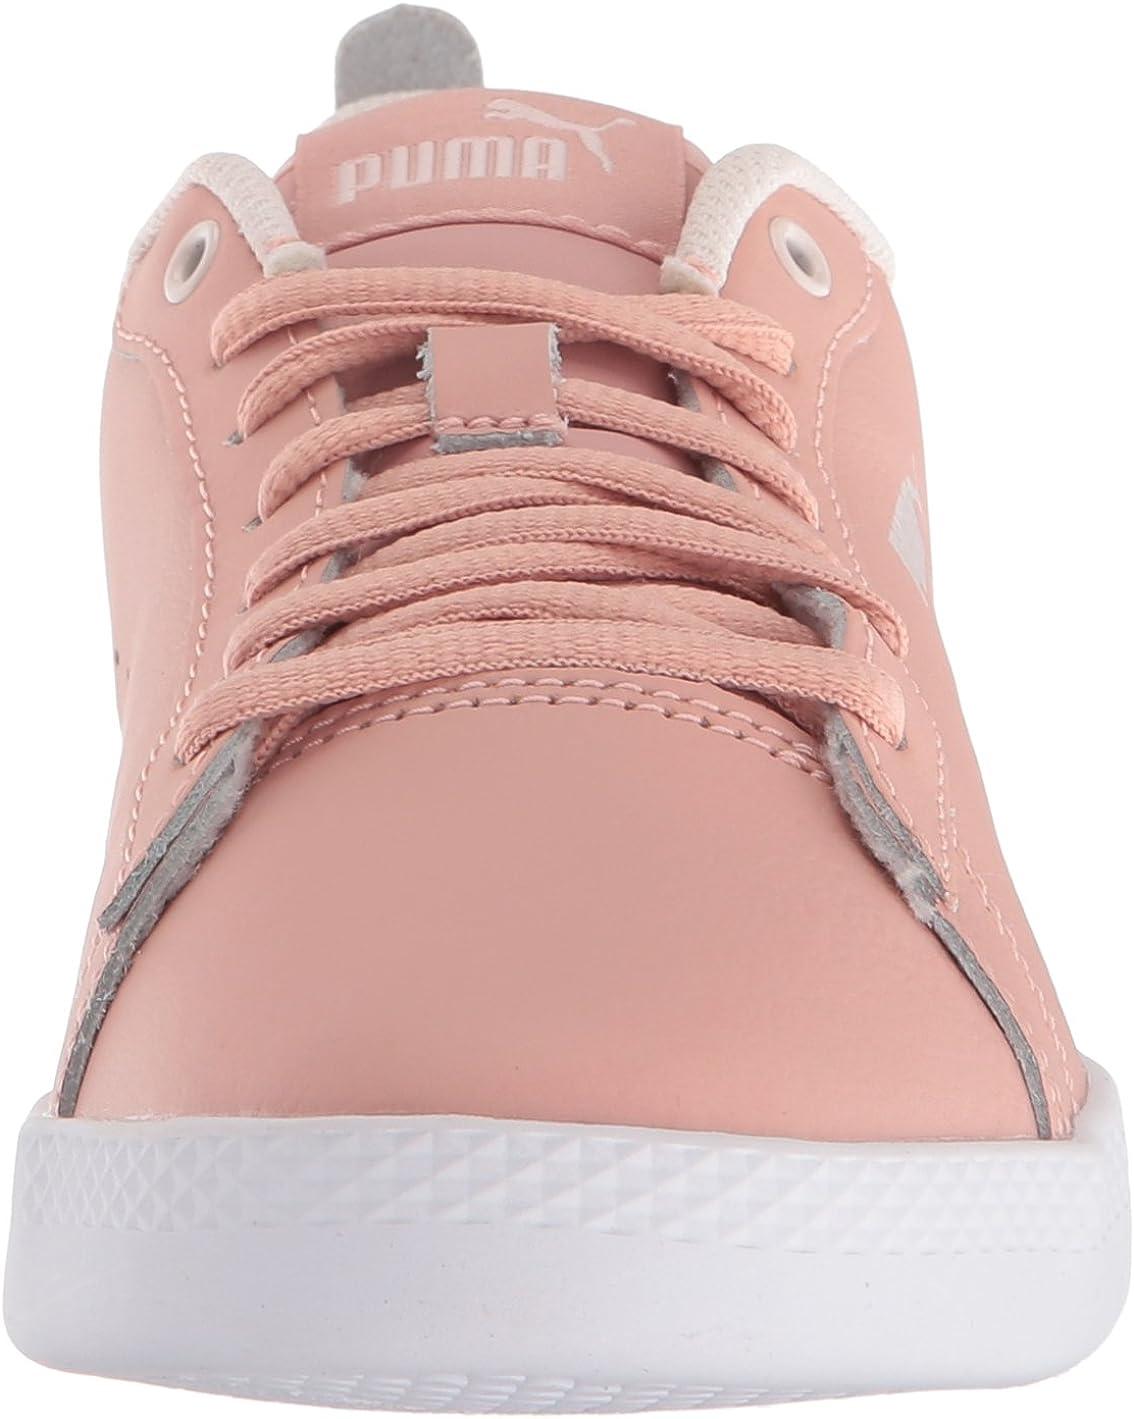 PUMA Women's Smash WNS V2 Leather Perf Sneaker: Amazon.co.uk